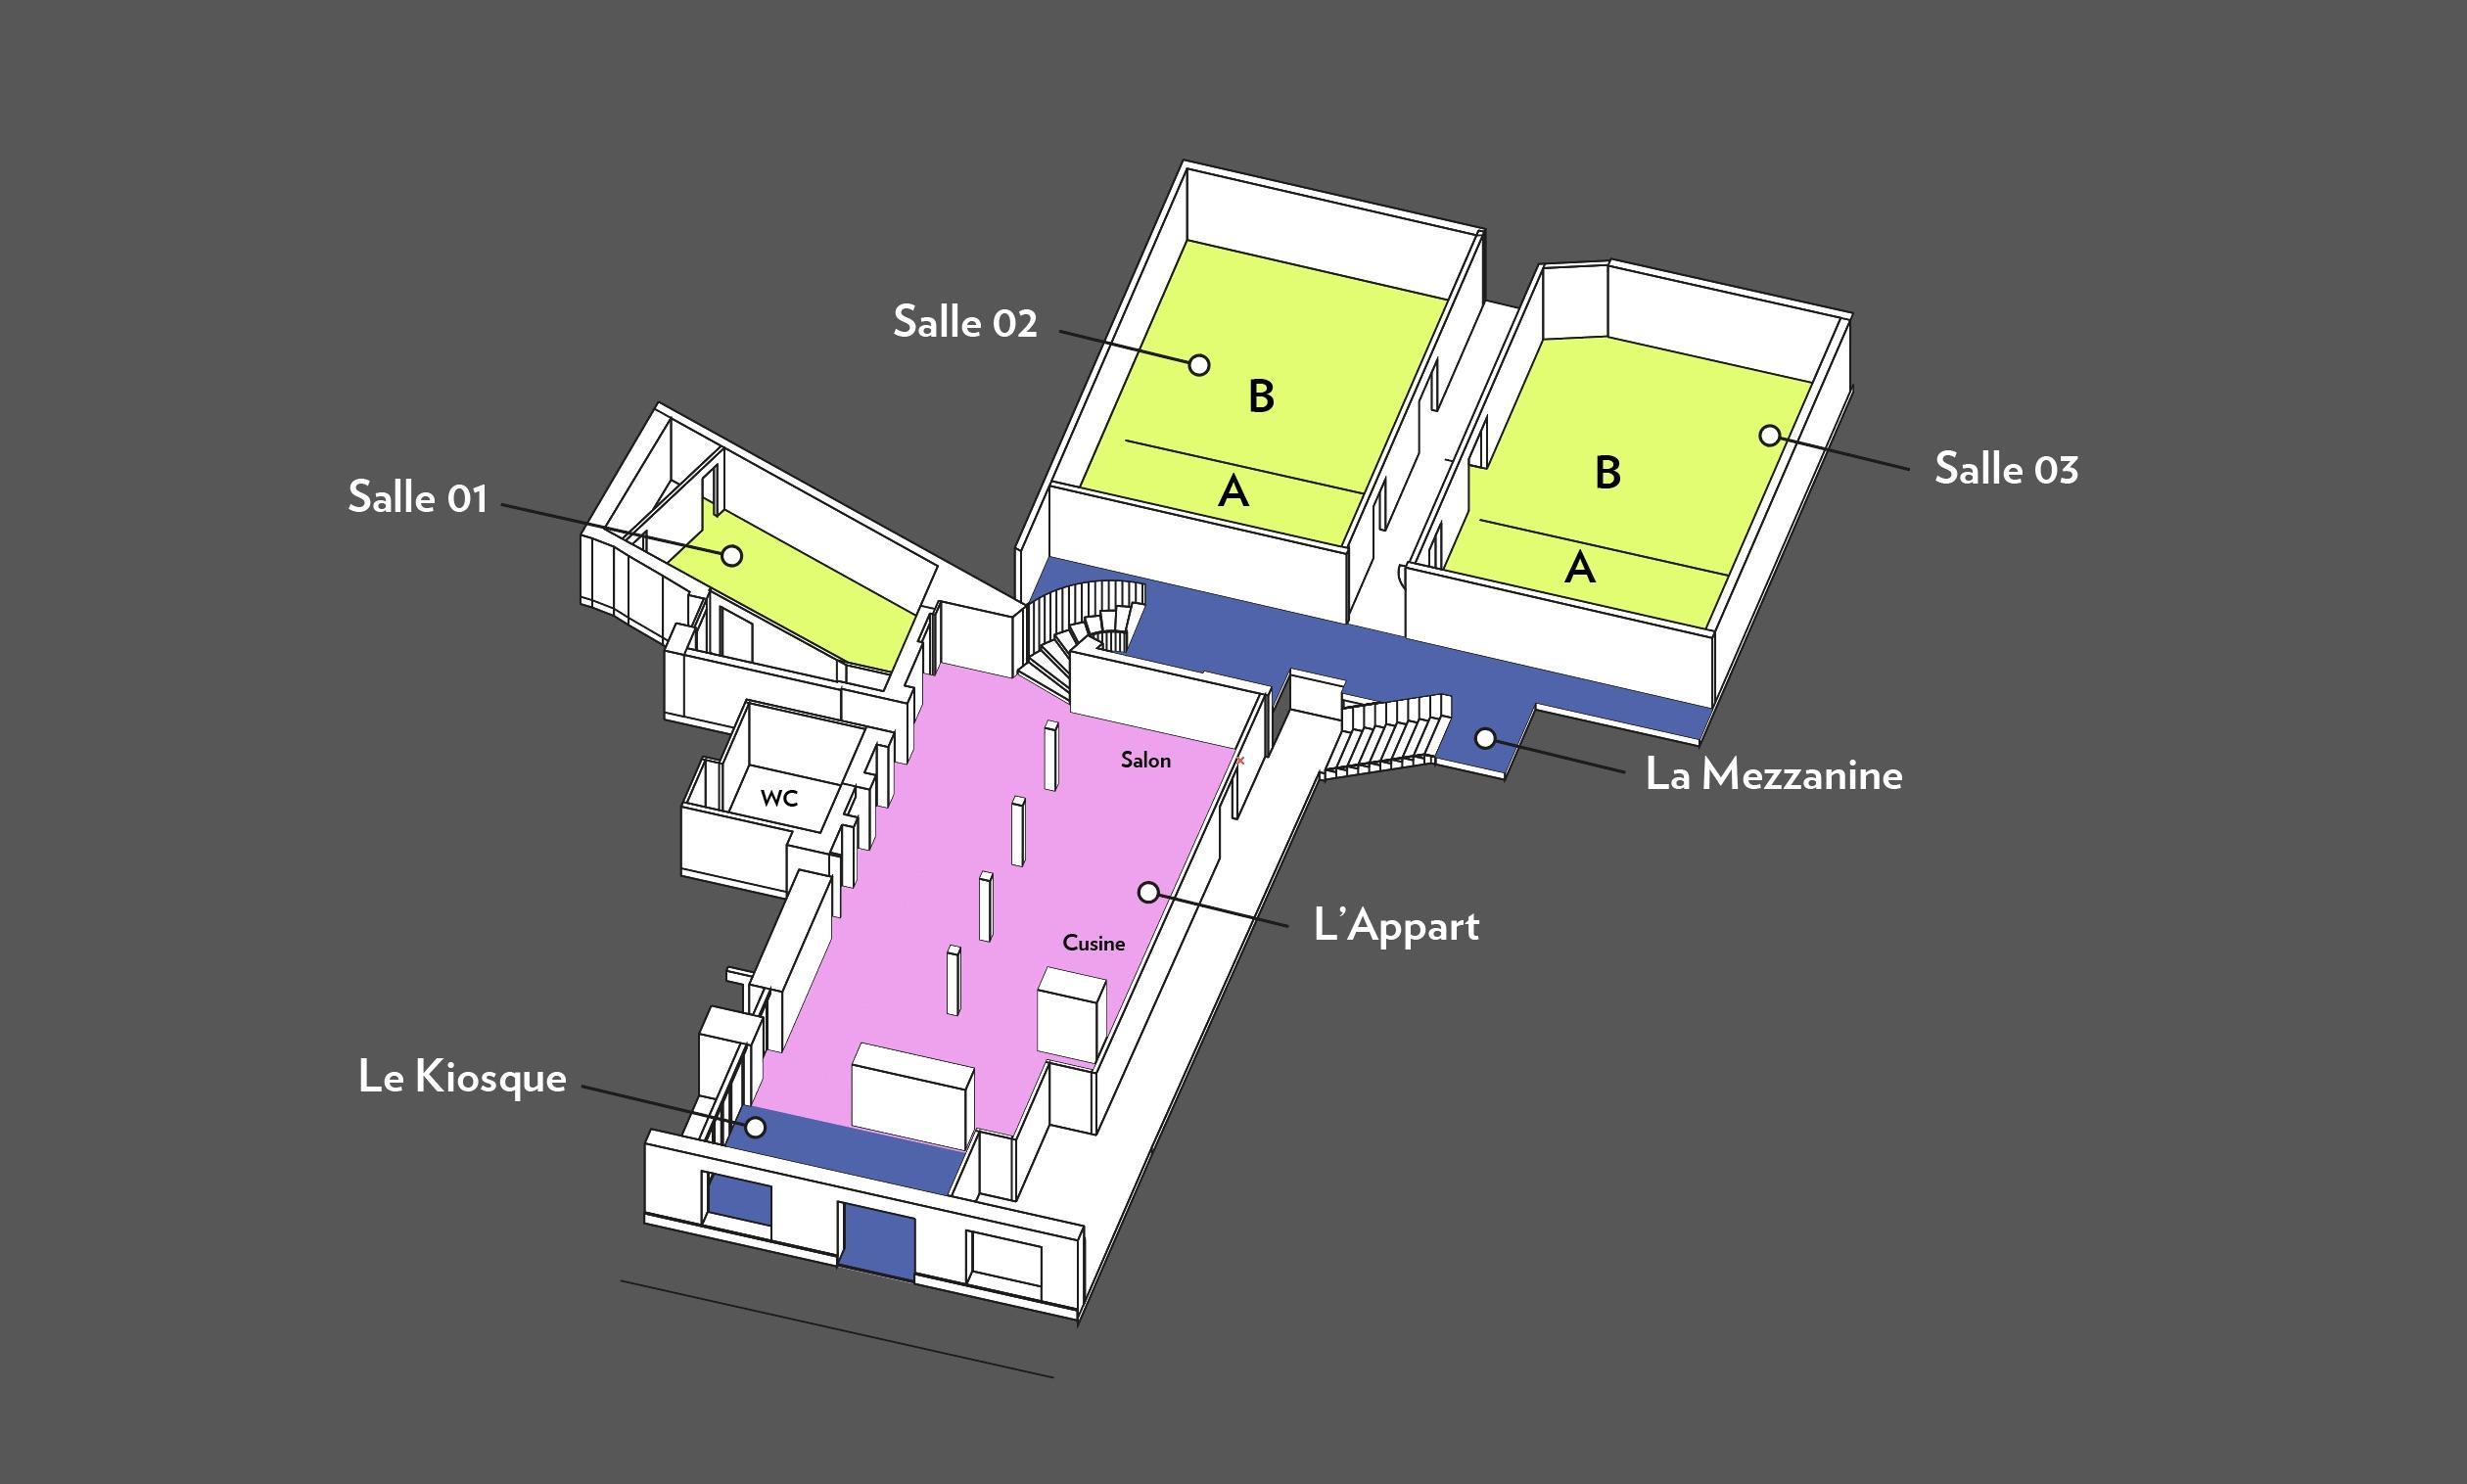 Event space concept in Paris (work in progress by Creative Supply); Hotel ... & Hotel Concept ≠ Interior Design | By Youri Sawerschel \u2013 Hospitality Net